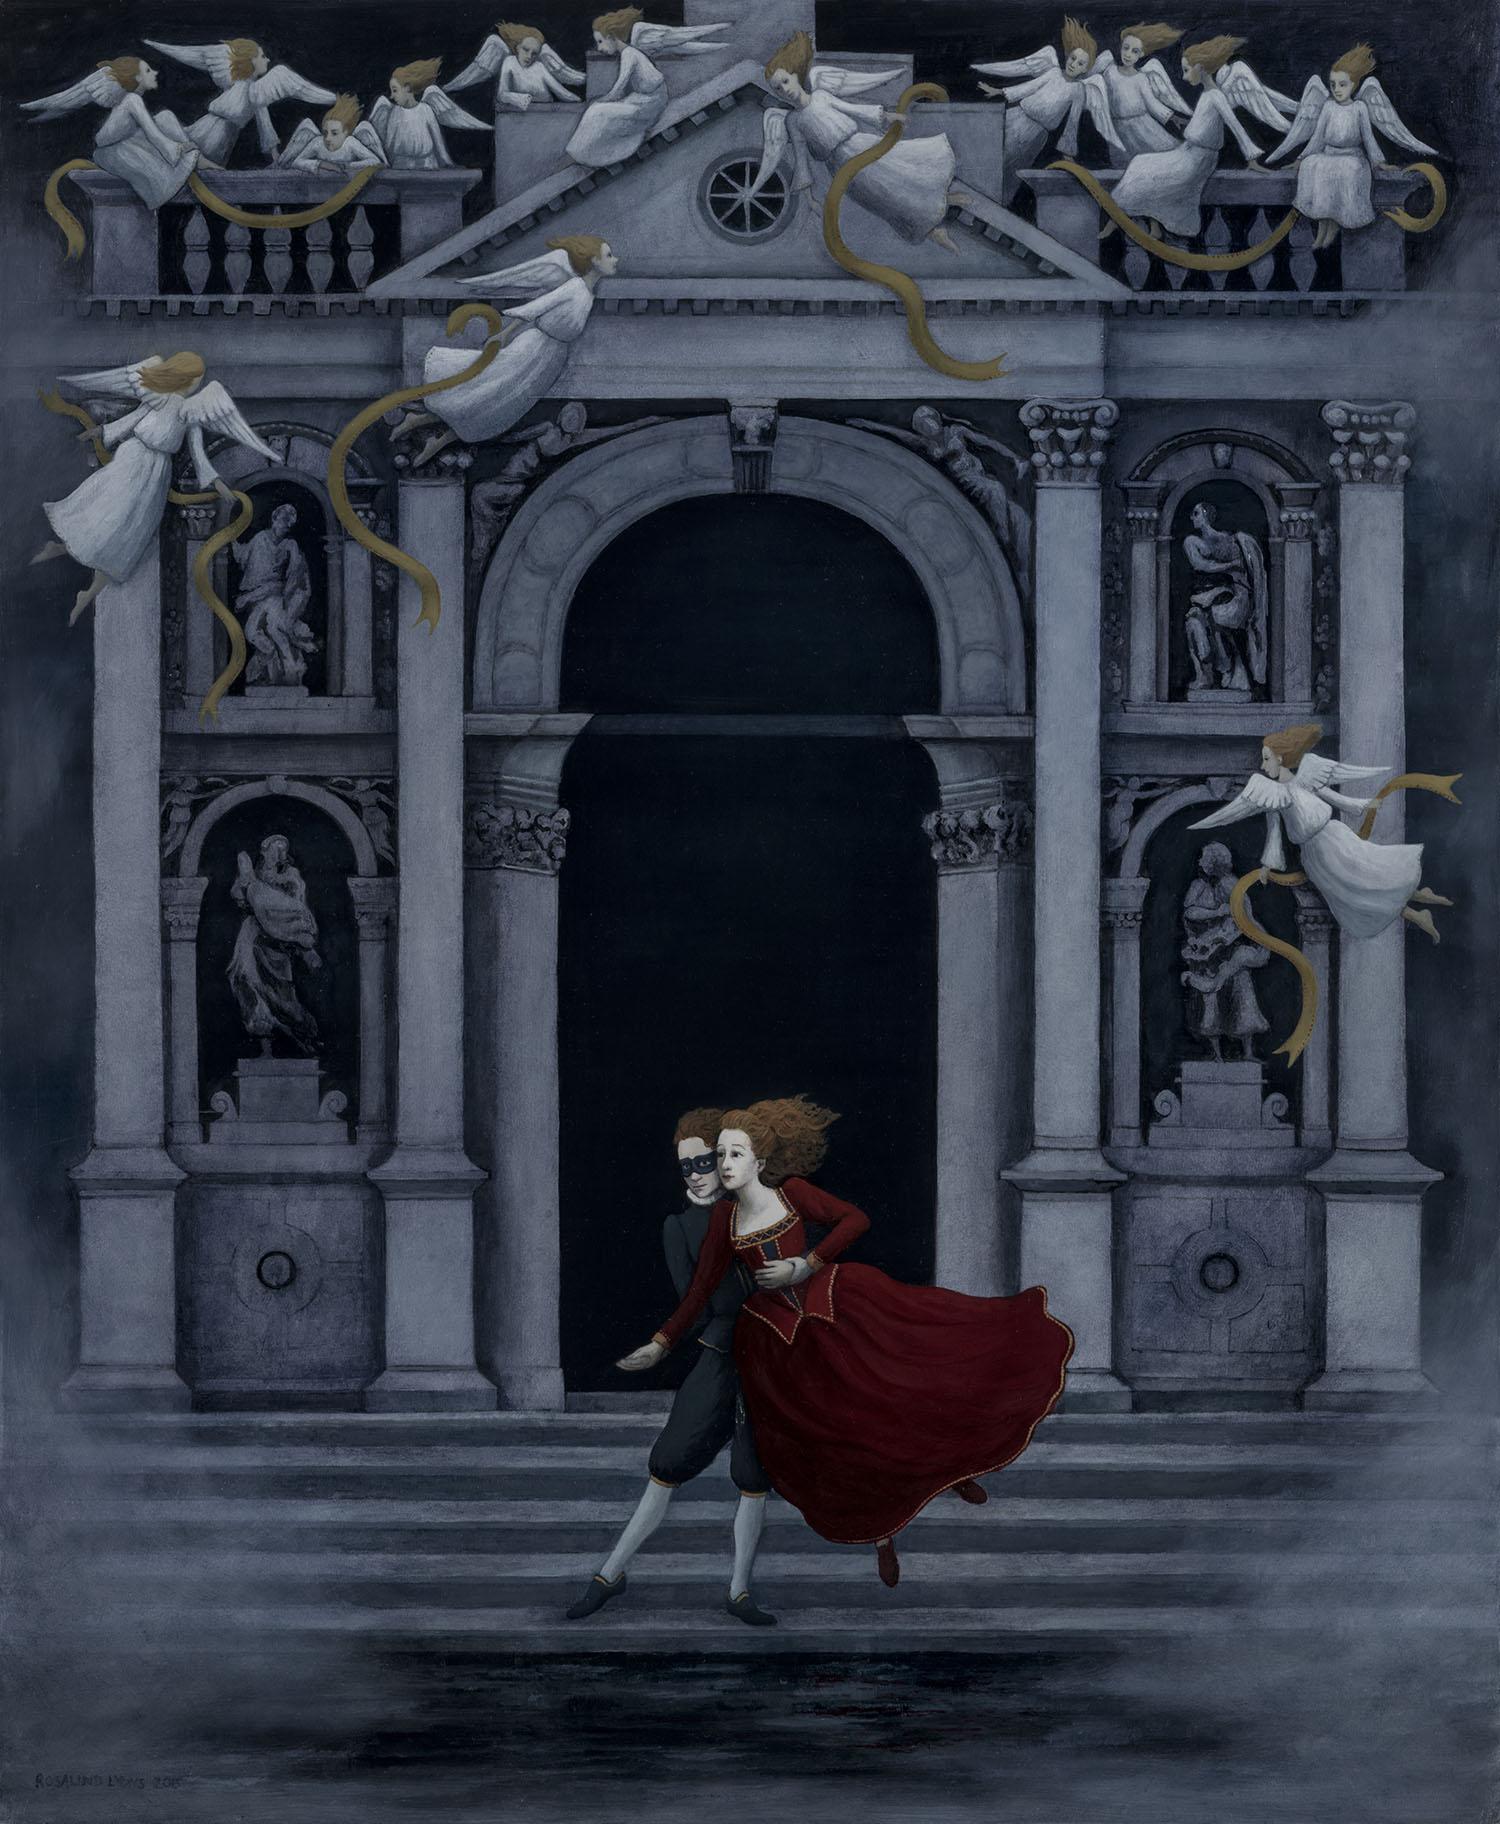 RosalindLyons artistinresidenceatShakespeare'sGlobe